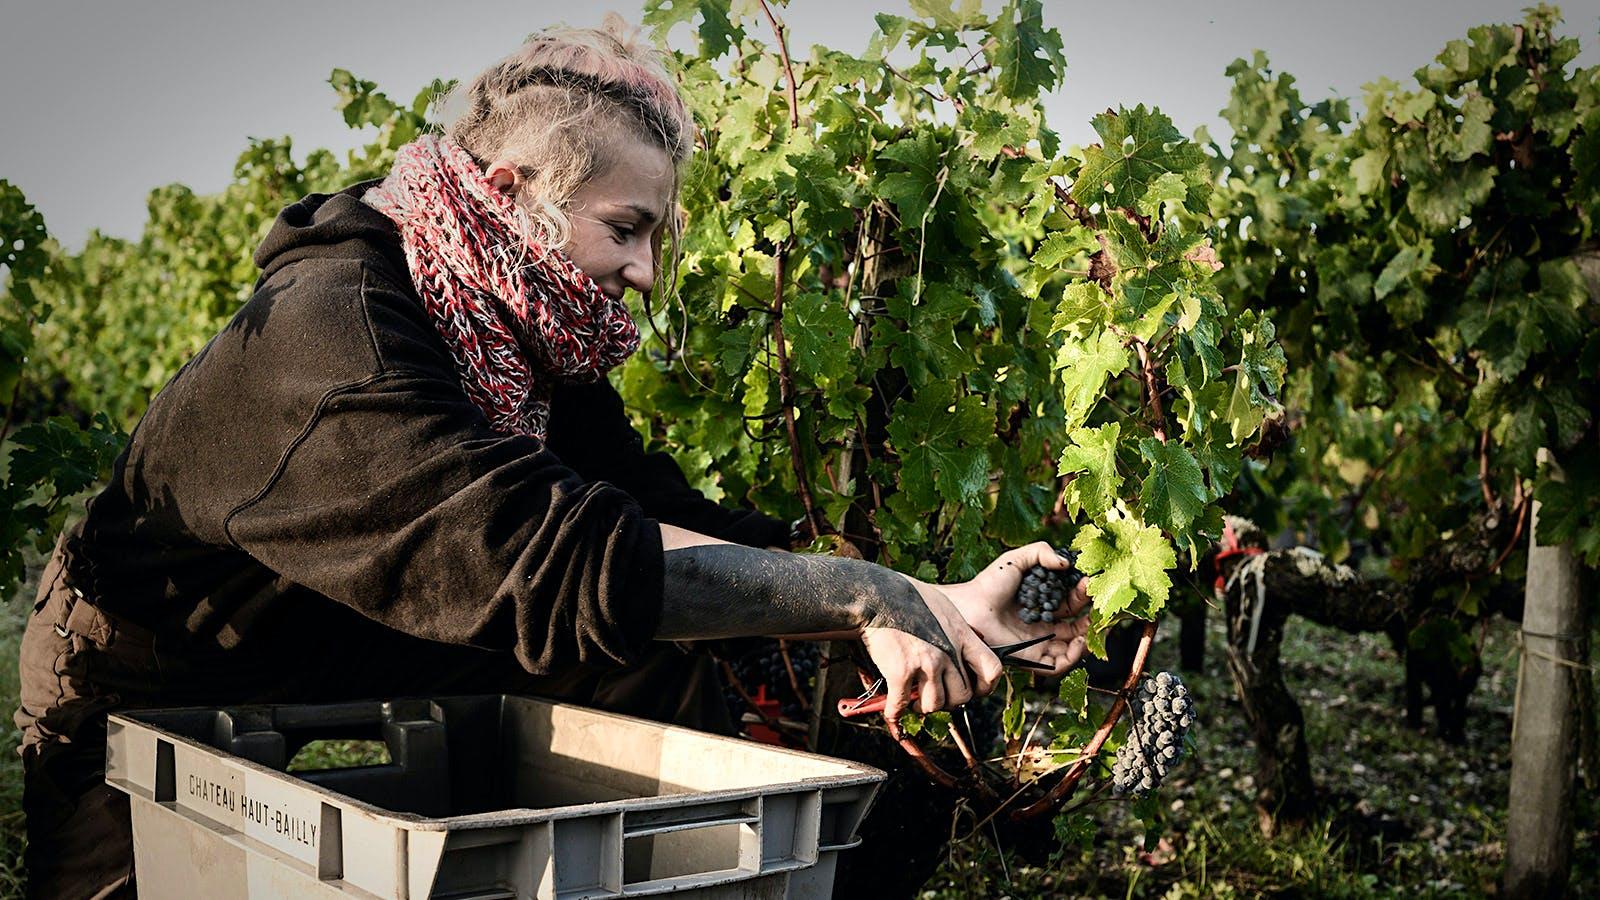 The Social Distance Vintage: Harvest in Bordeaux